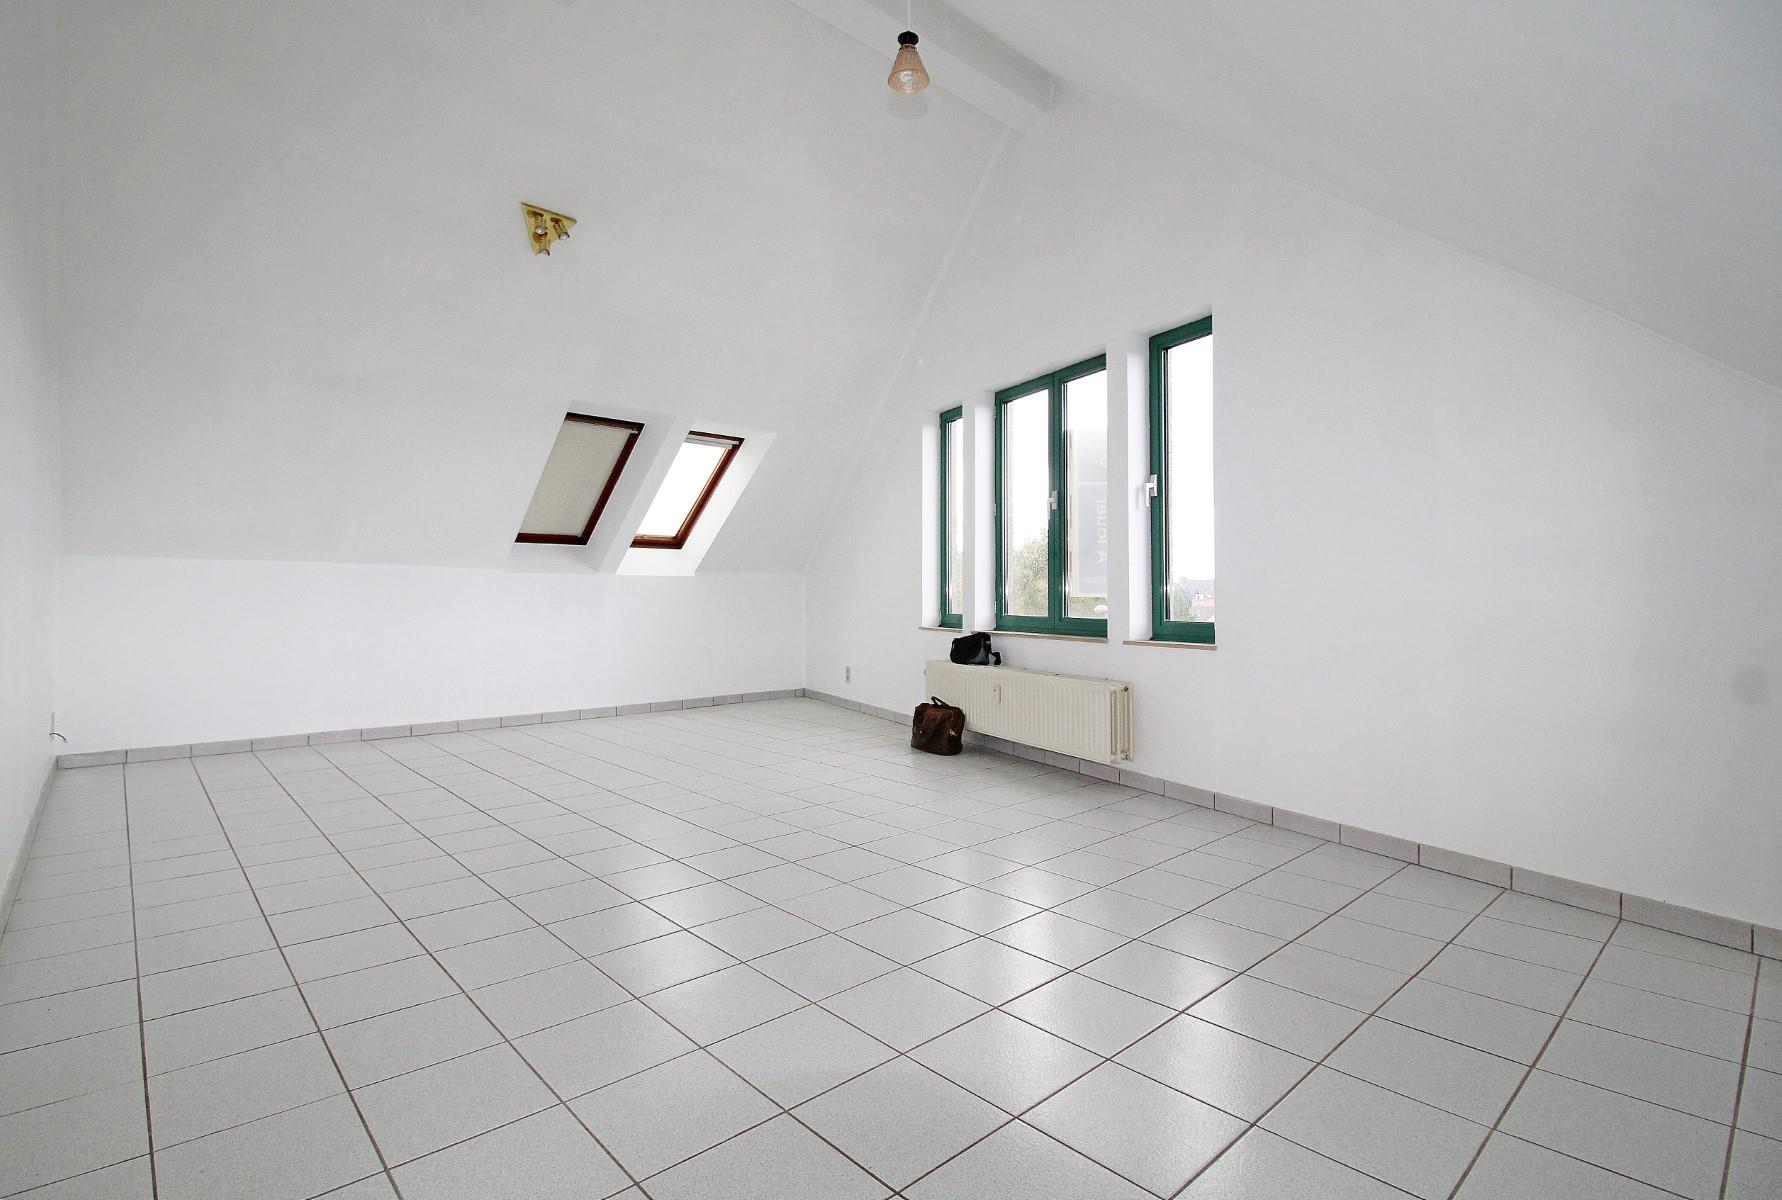 Appartement - Eghezée - #4140908-1